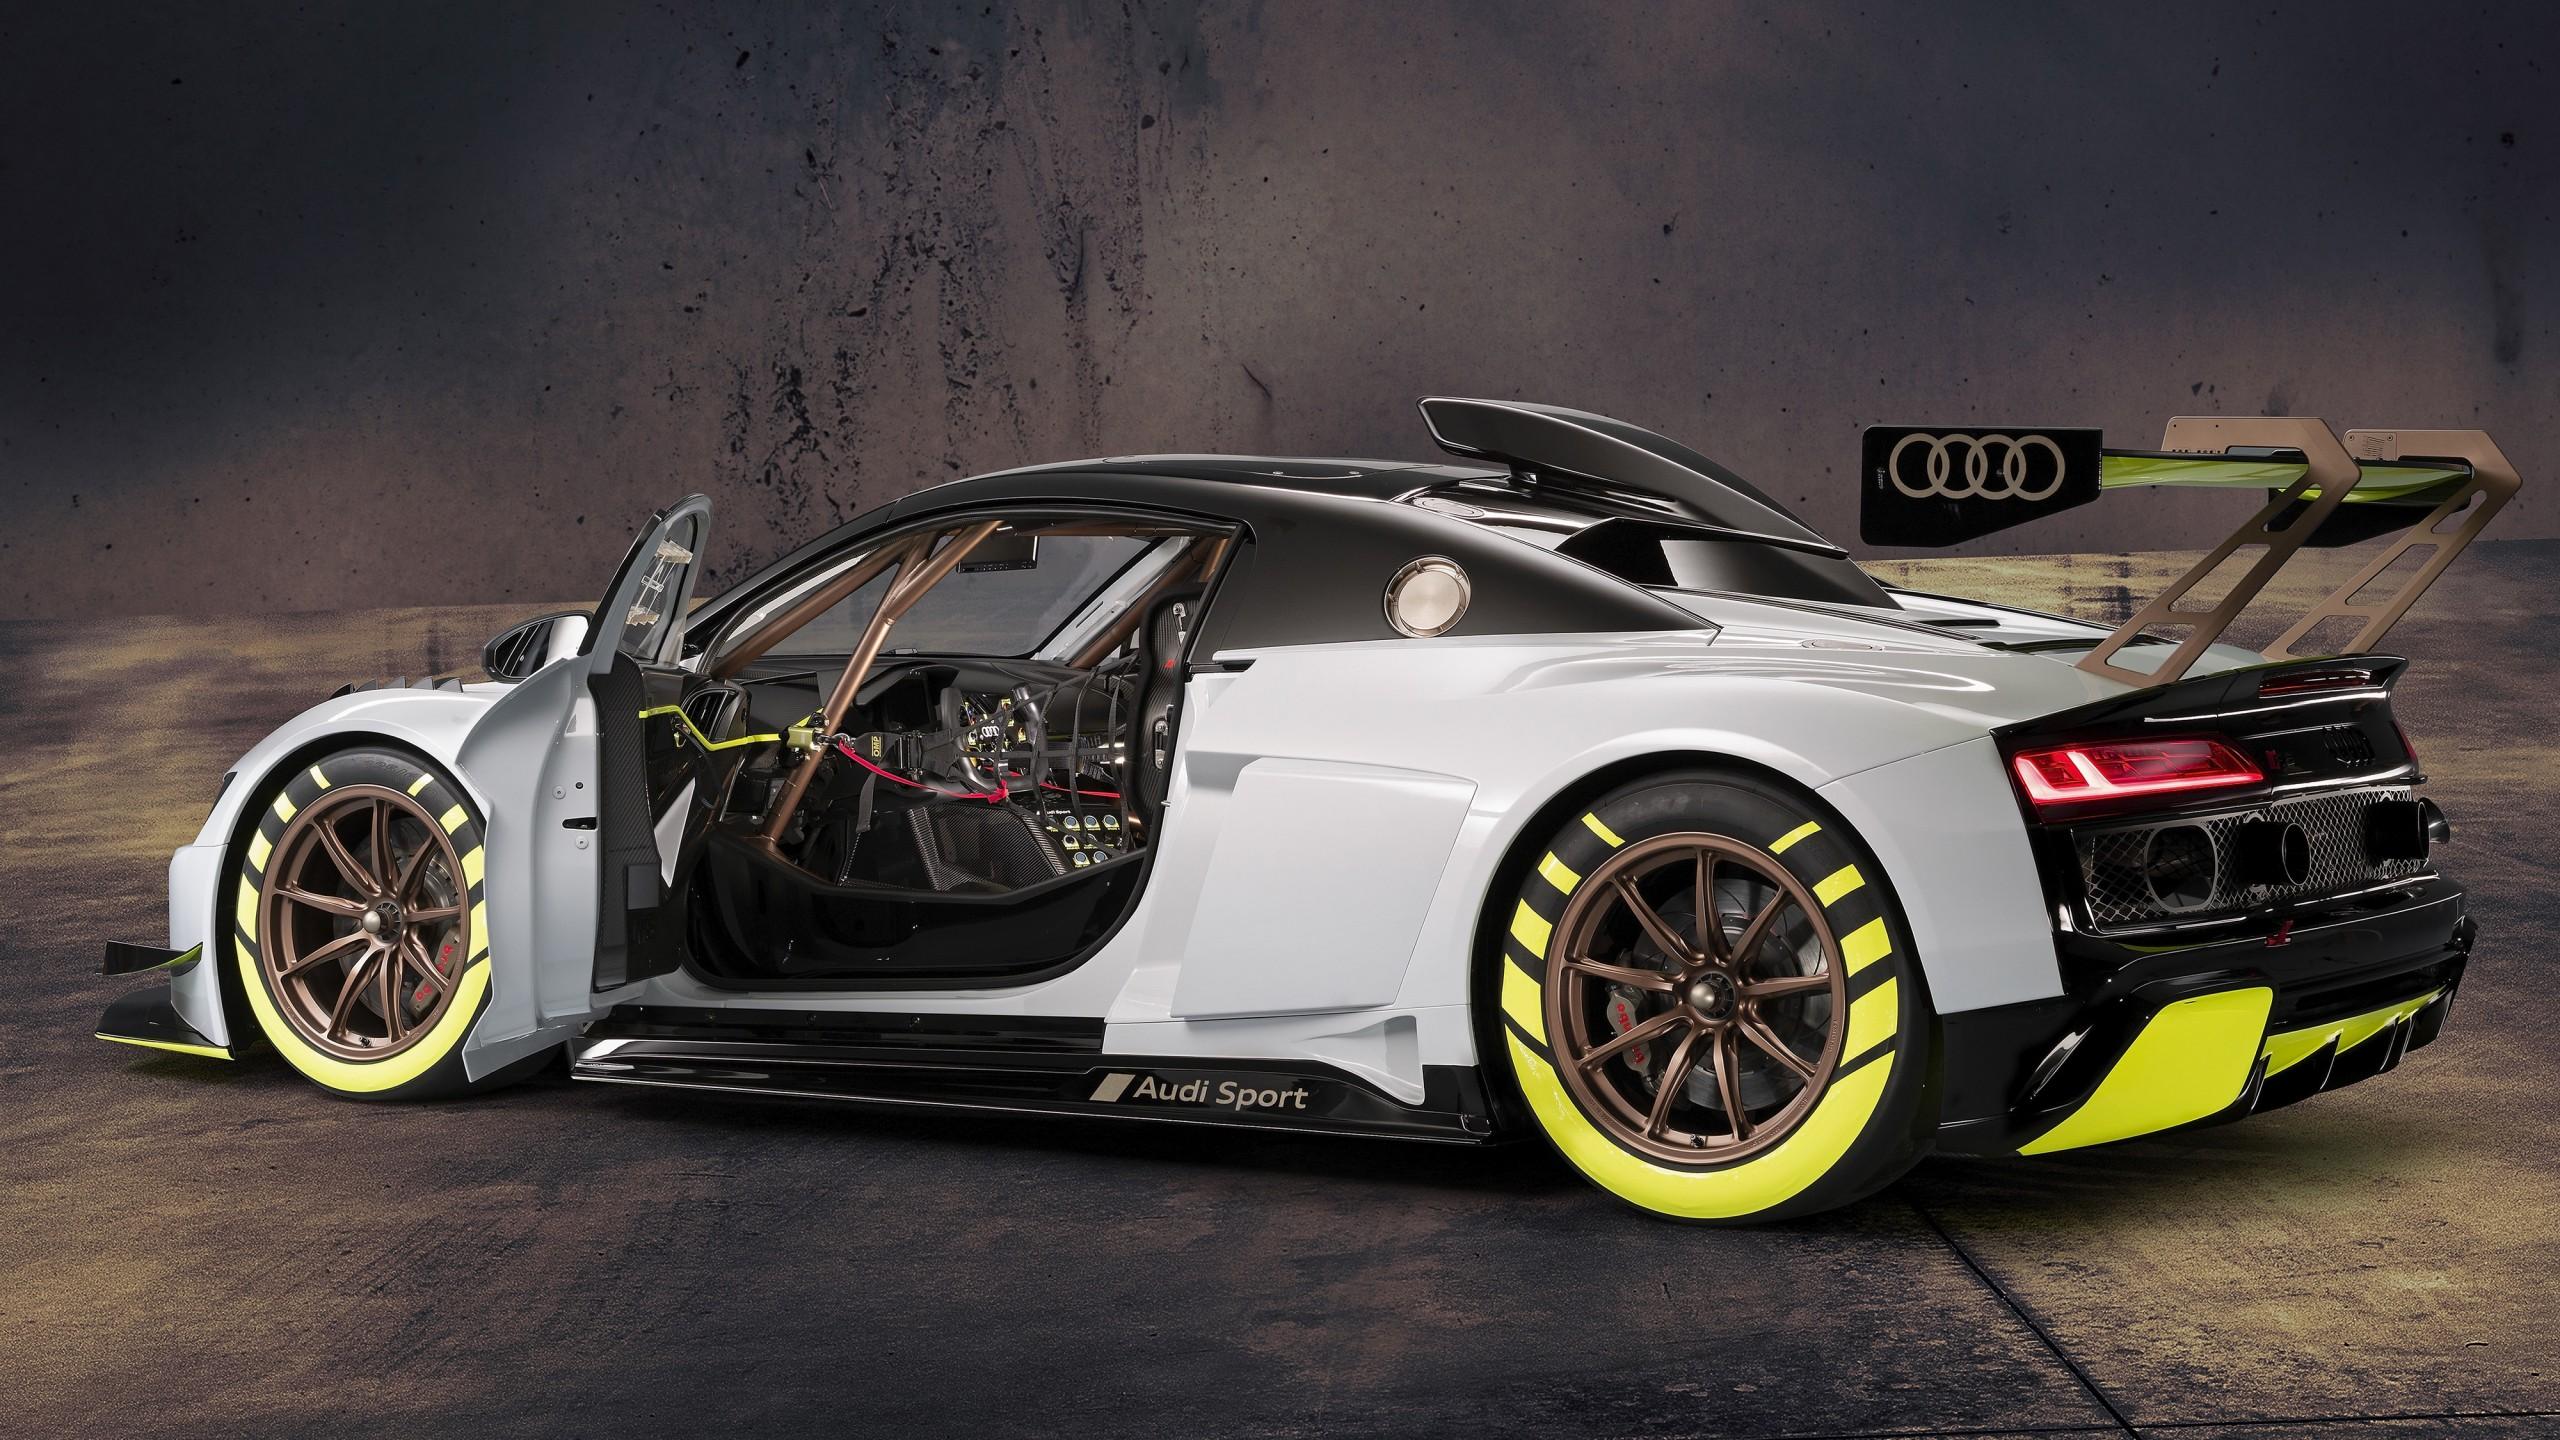 Audi R8 LMS GT2 2019 4K 2 Wallpaper   HD Car Wallpapers ...